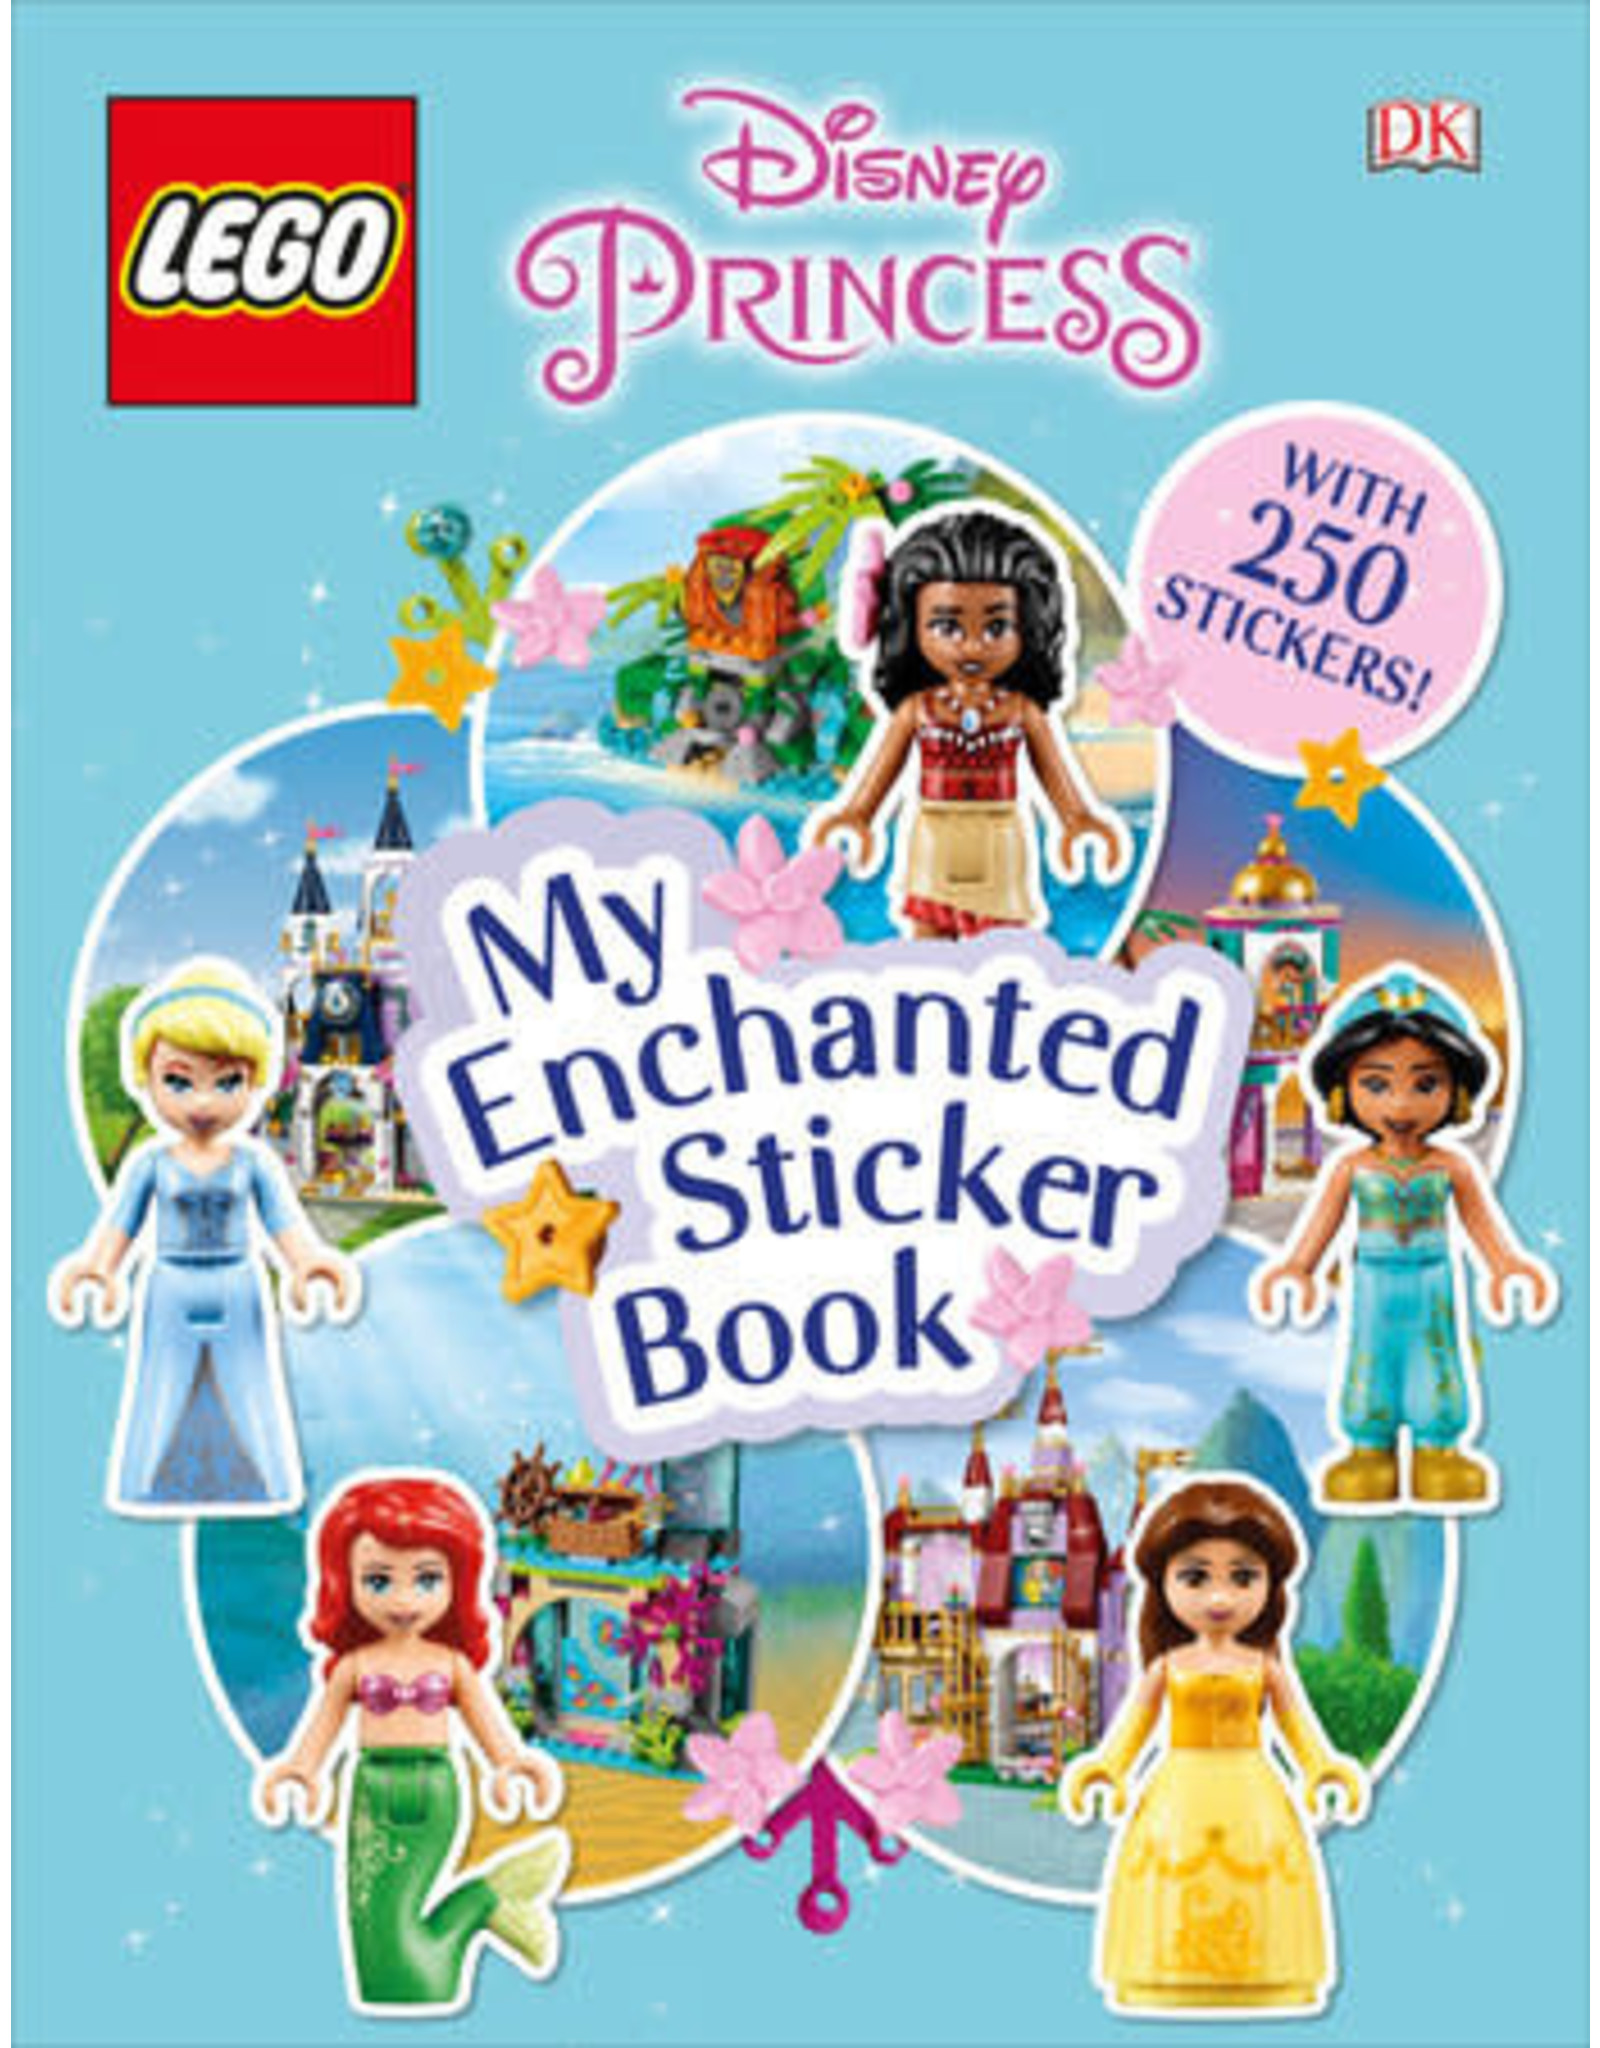 DK LEGO Disney Princess My Enchanted Sticker Book